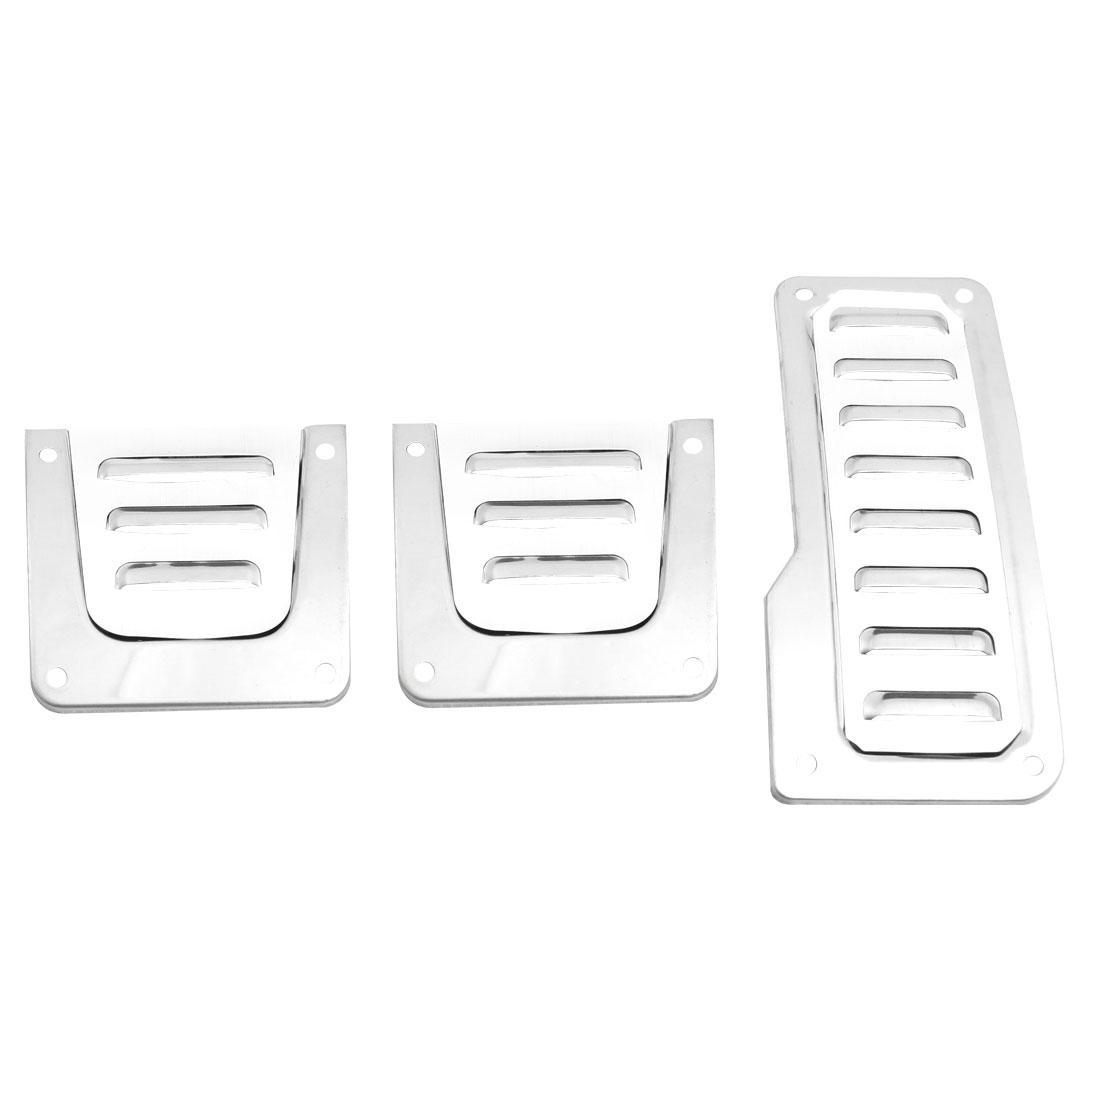 Vehicles Car Silver Tone Nonslip Metal Gas Clutch Brake Pedal Covers 3PCS